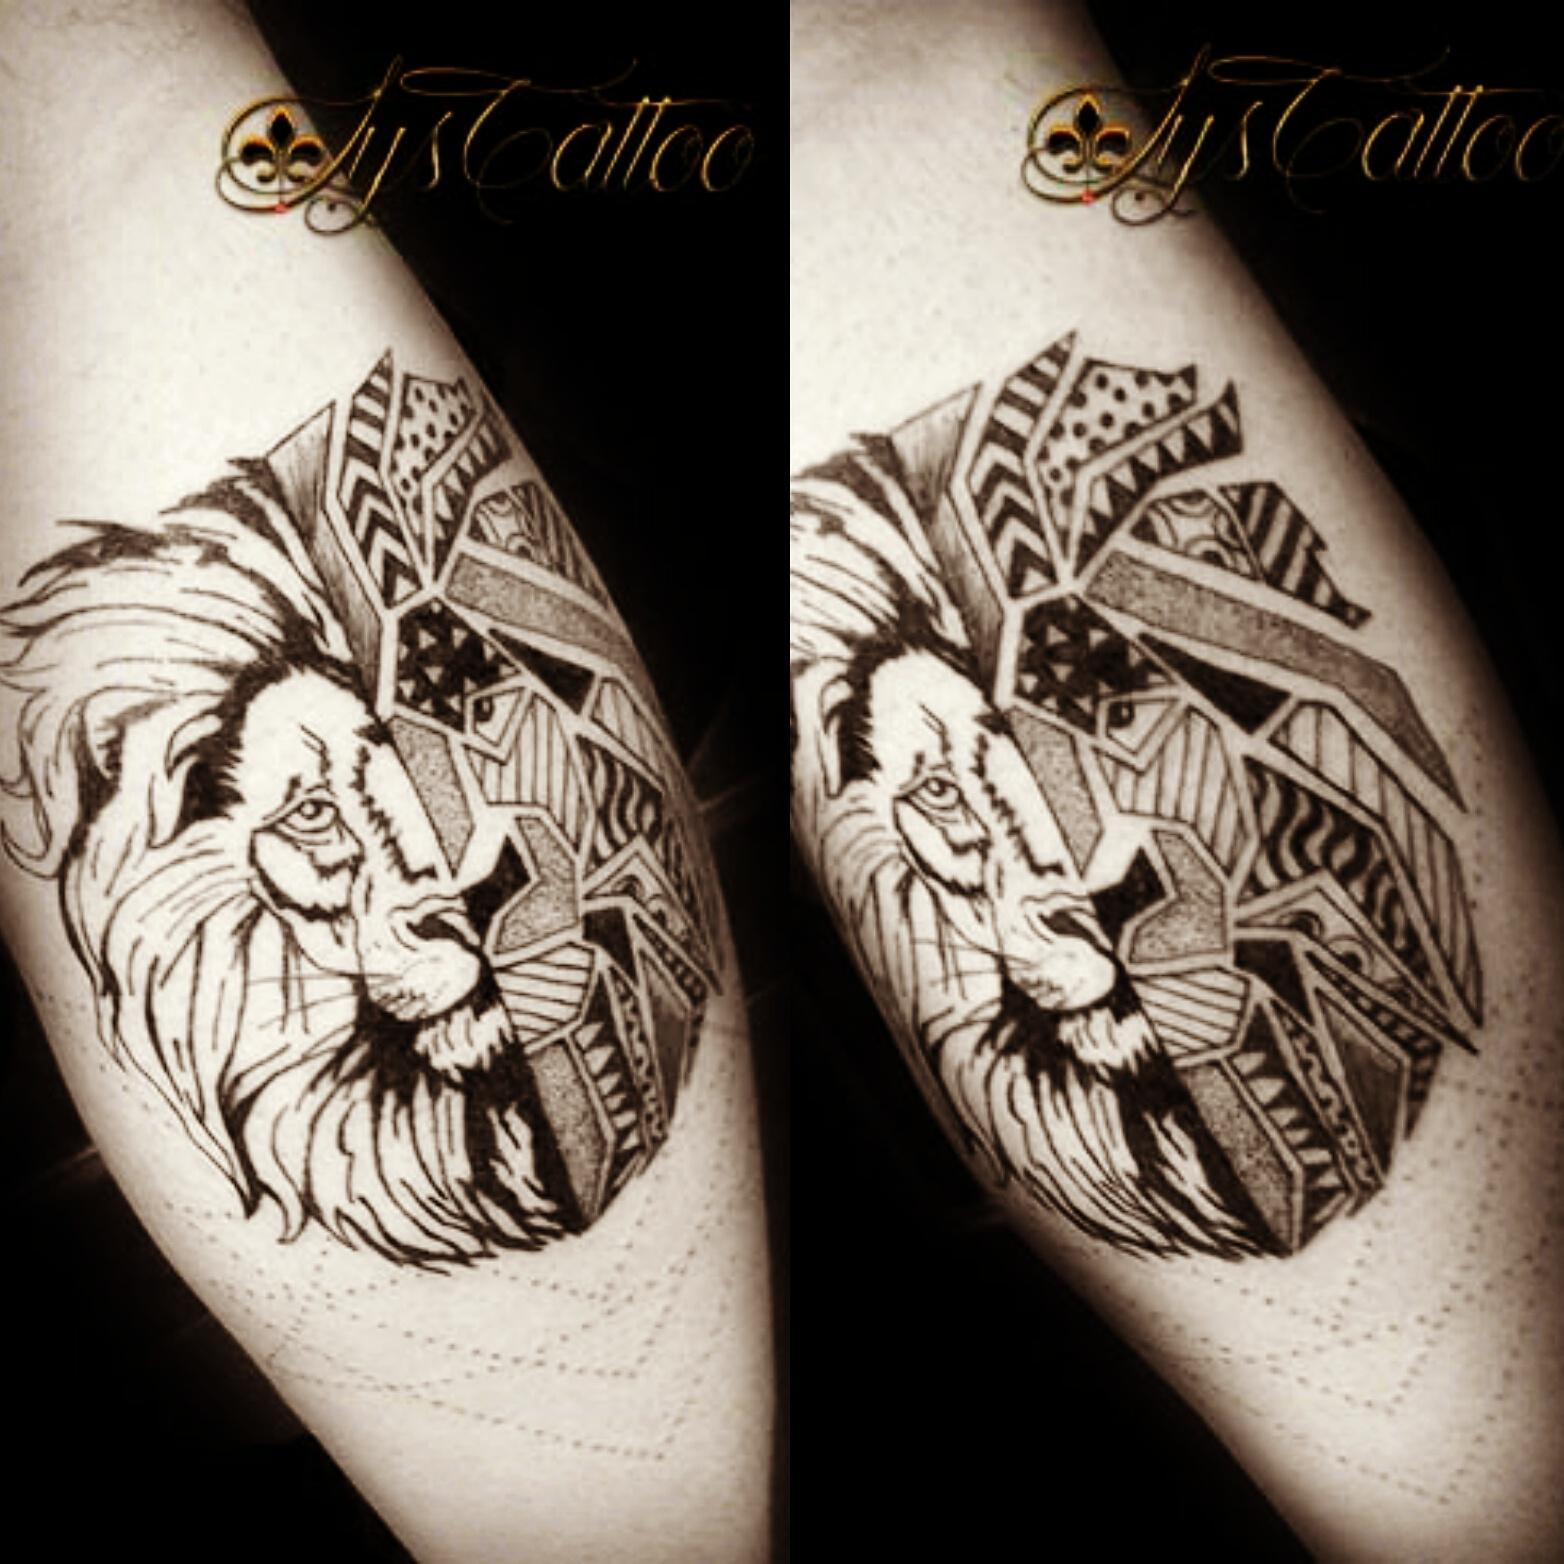 tatouage mollet homme bordeaux giron